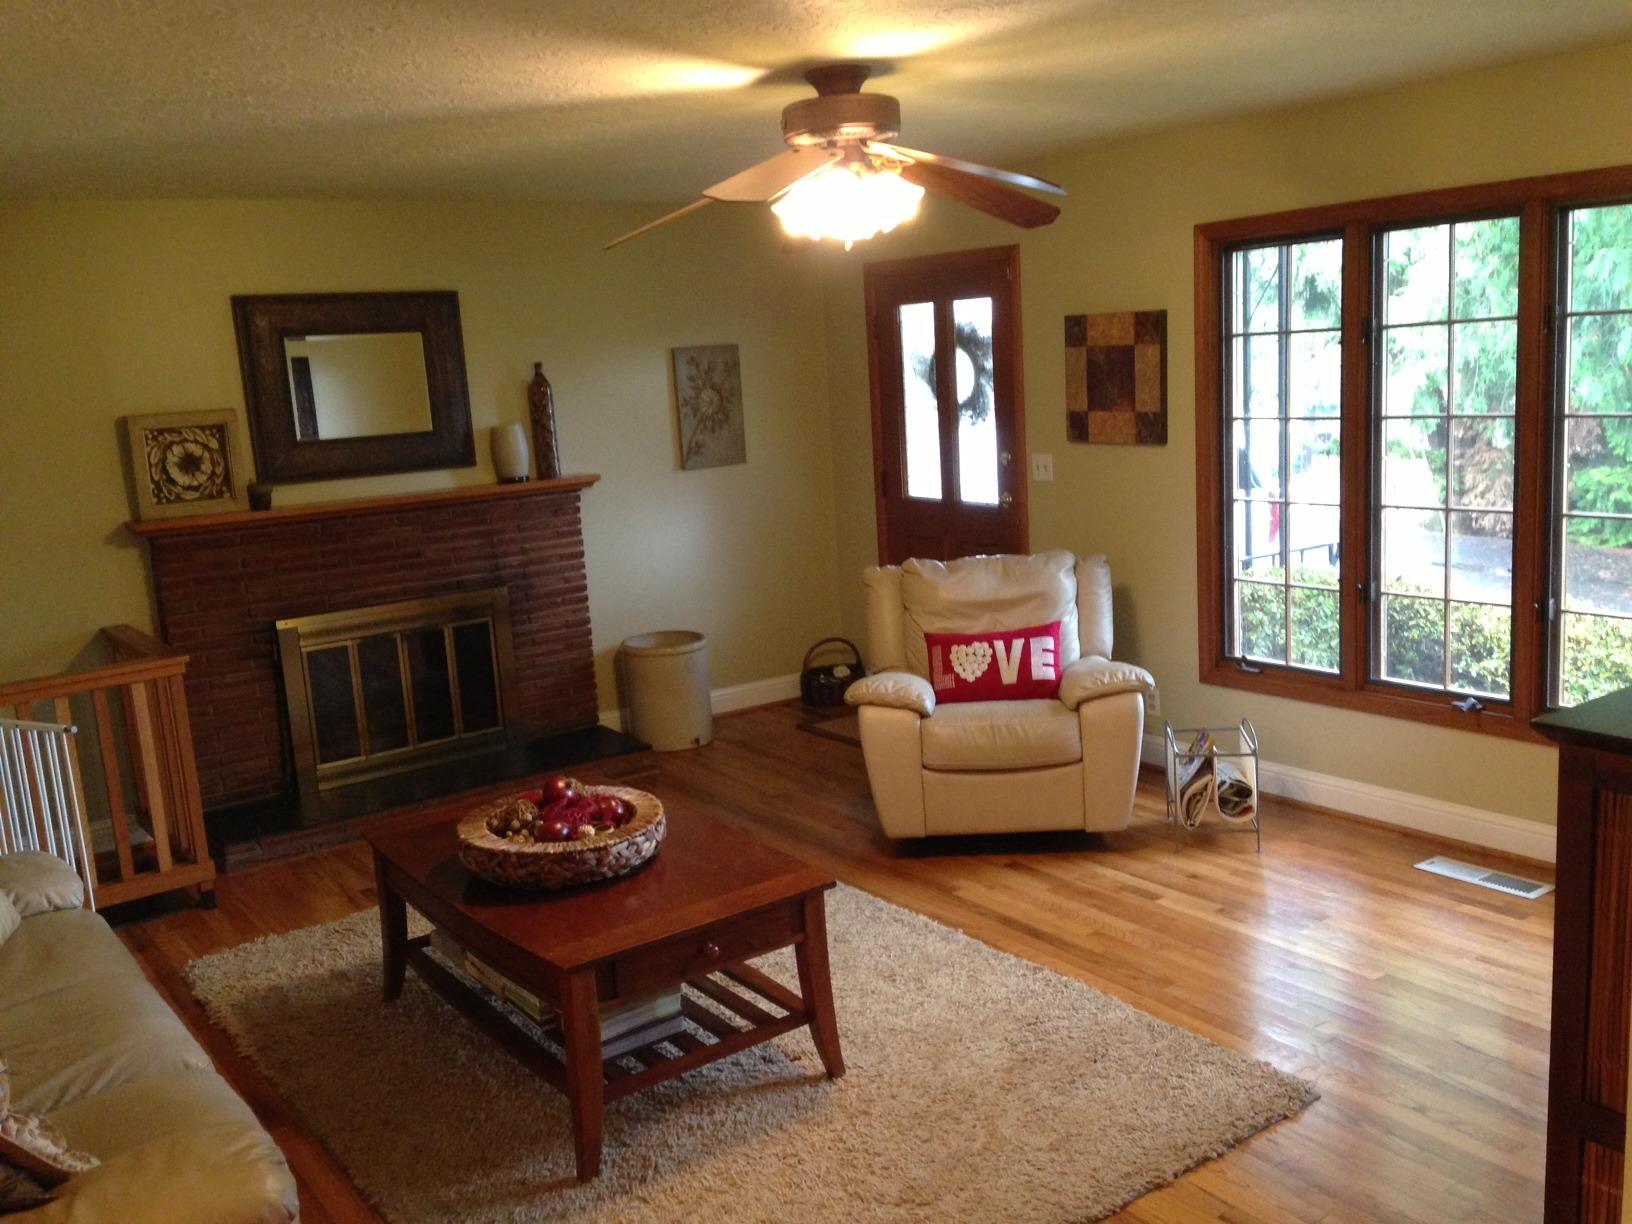 Laminated Flooring In Living Room